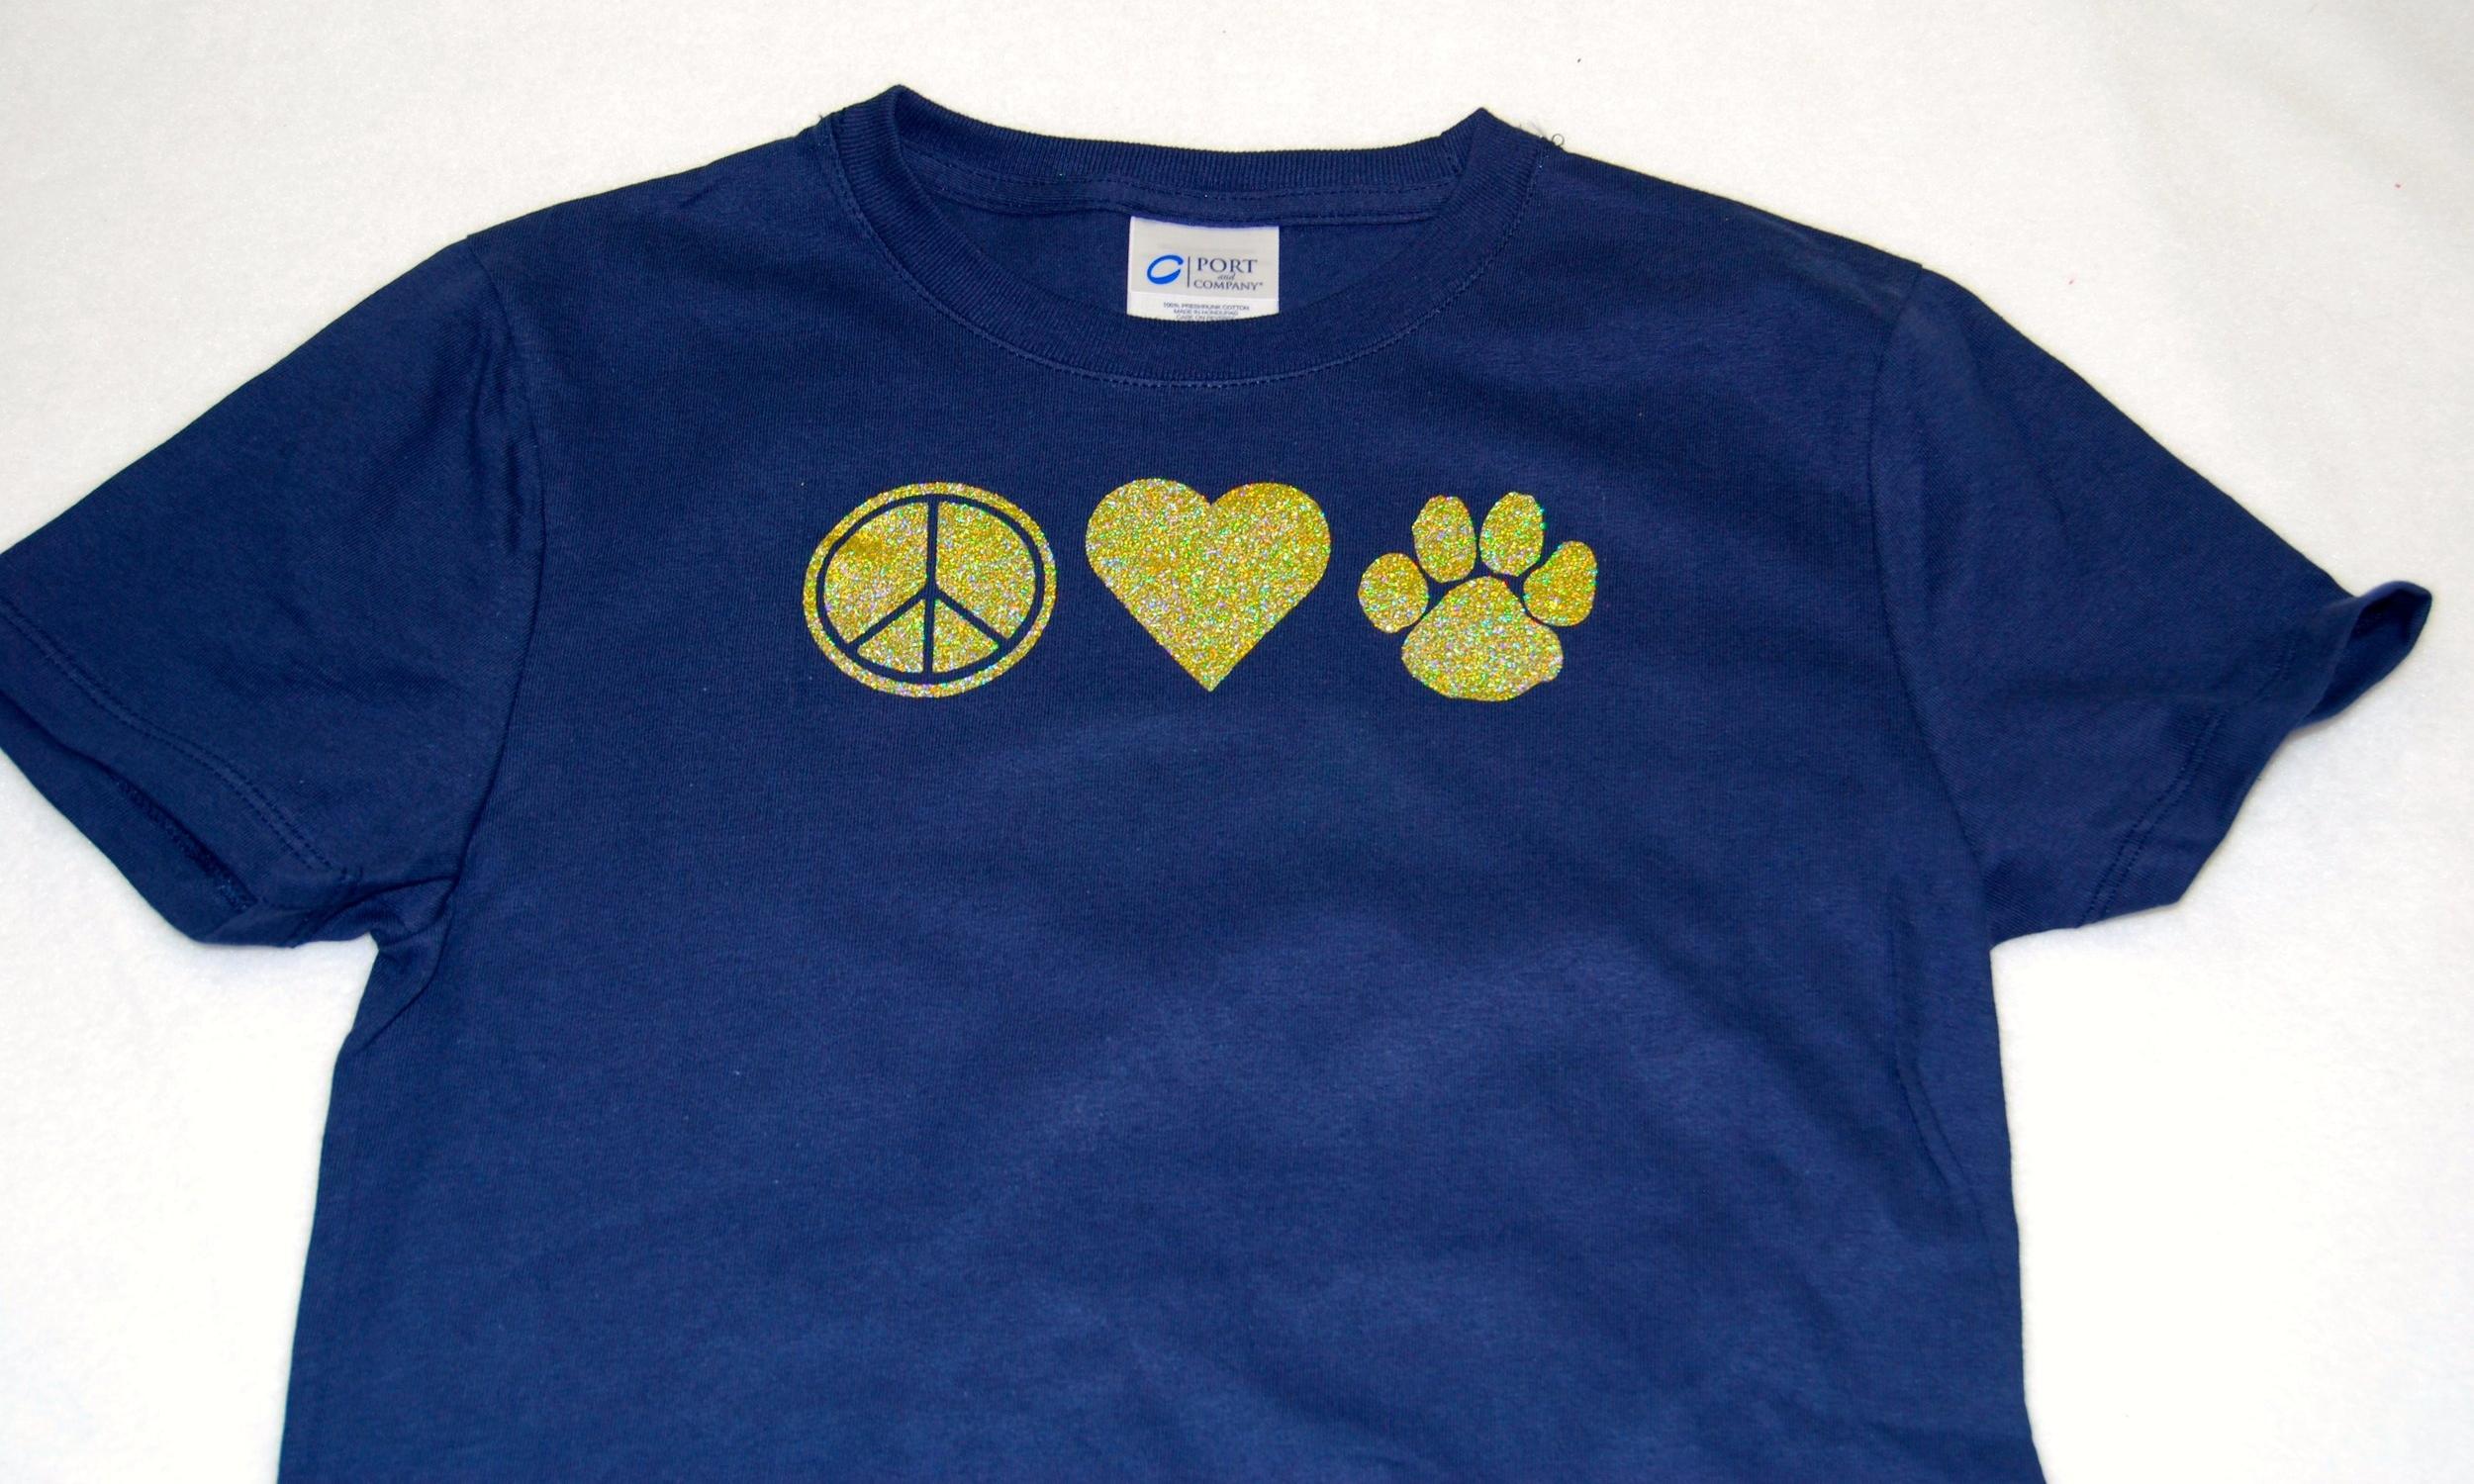 Peace-Love-Paw in gold glitter